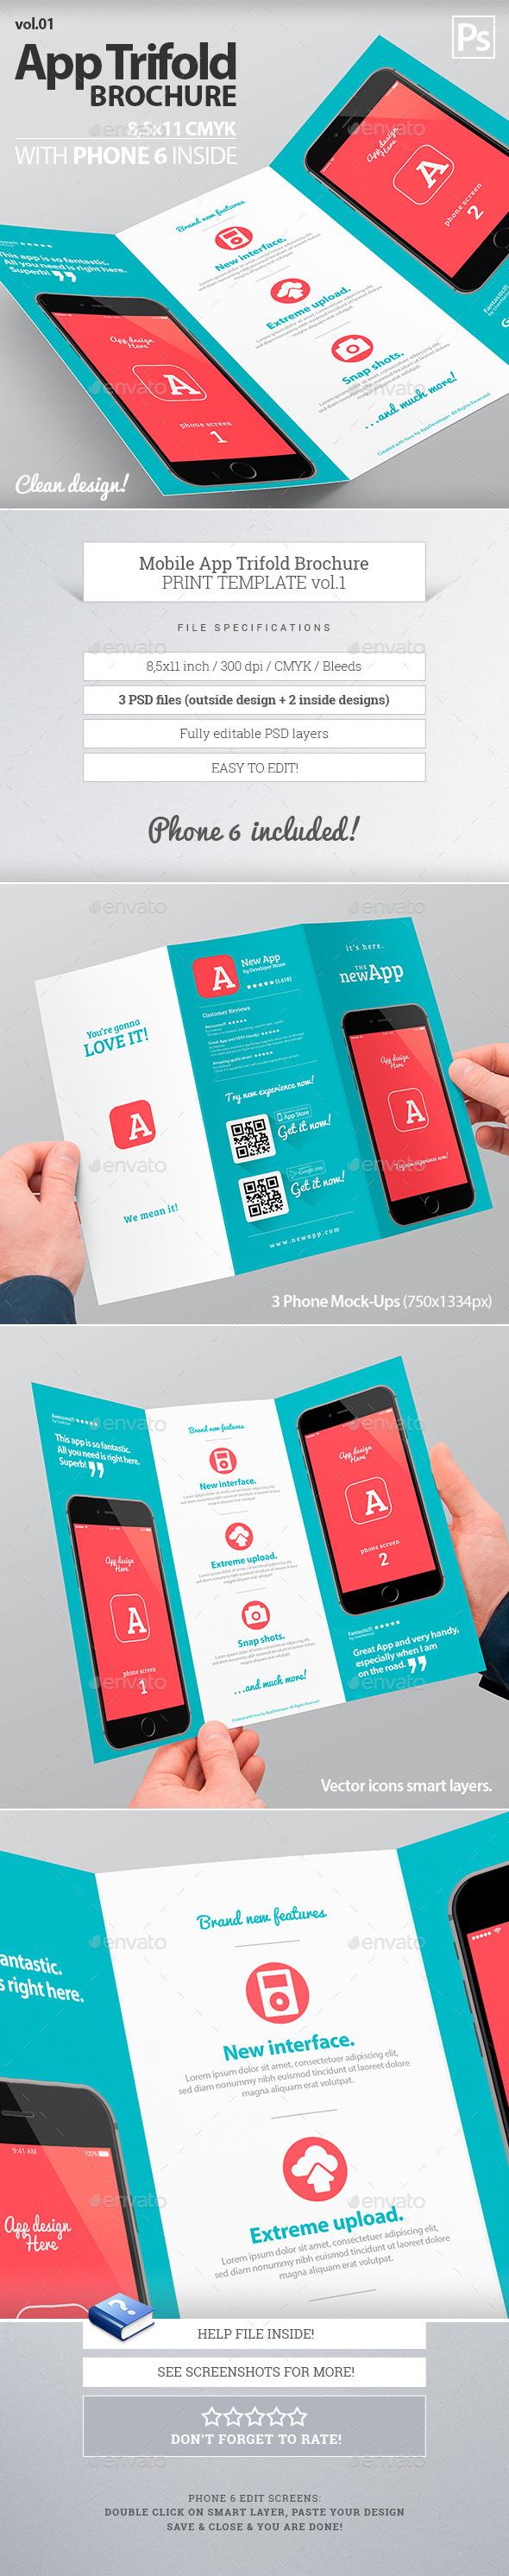 mobile app trifold brochure vol 1 by level studio graphicriver